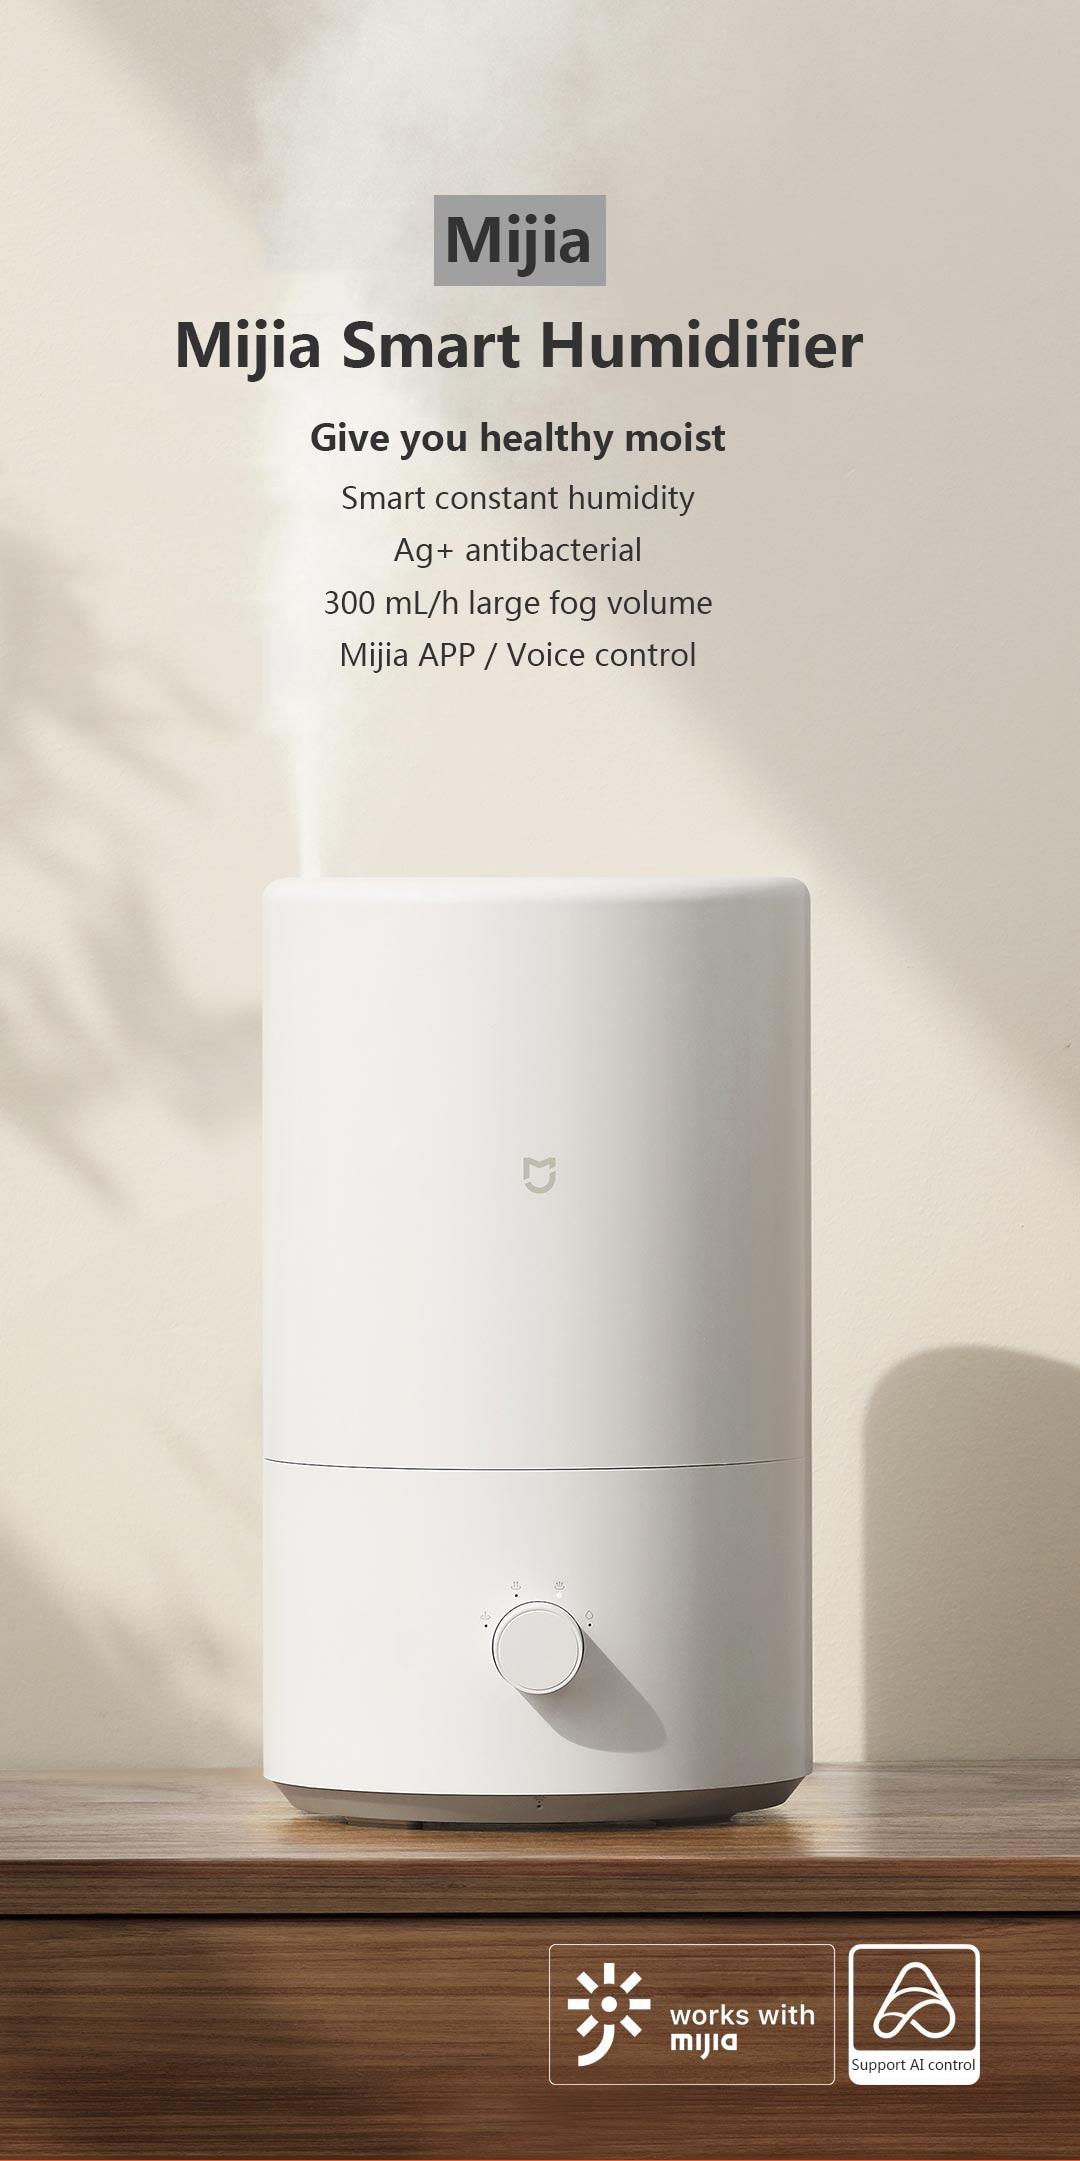 Xiaomi Mijia Smart Humidifier 25W 4L 300ml/h Heavy Fog Volume Constant Temperature Silver Ion Antibacterial Air Purifier 5